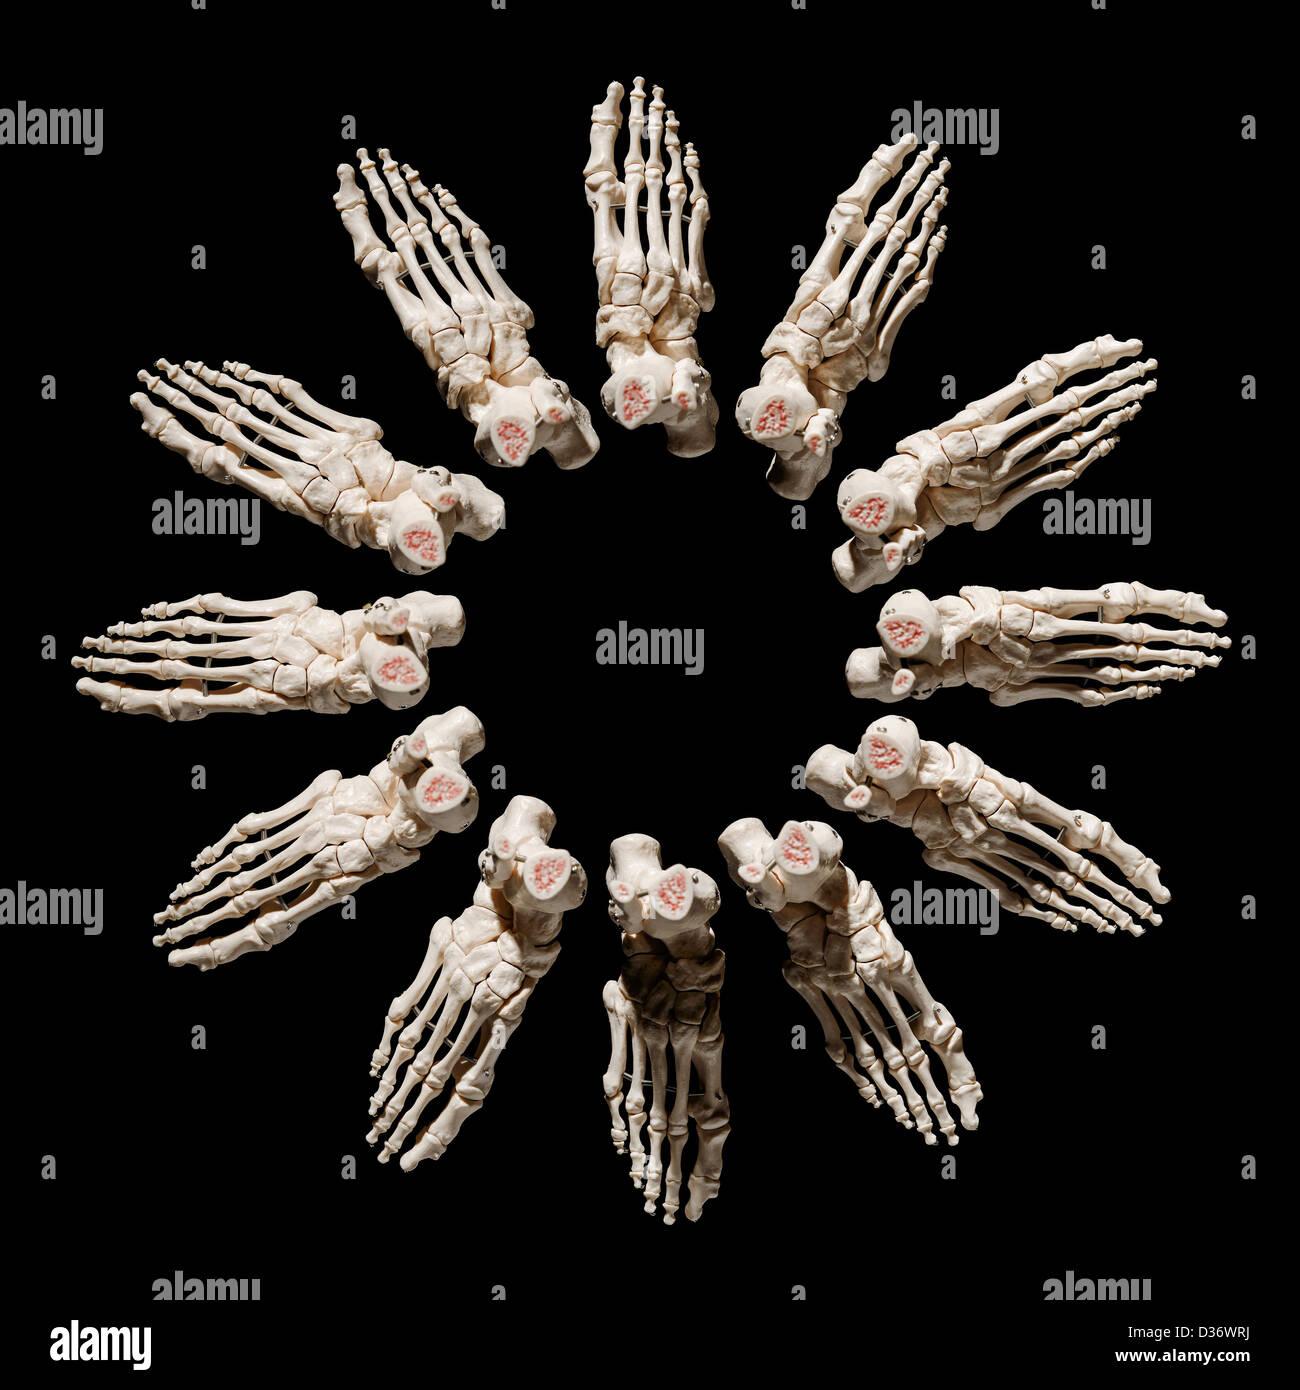 Twelve Skeleton Feet In A Circle Stock Photo 53627046 Alamy